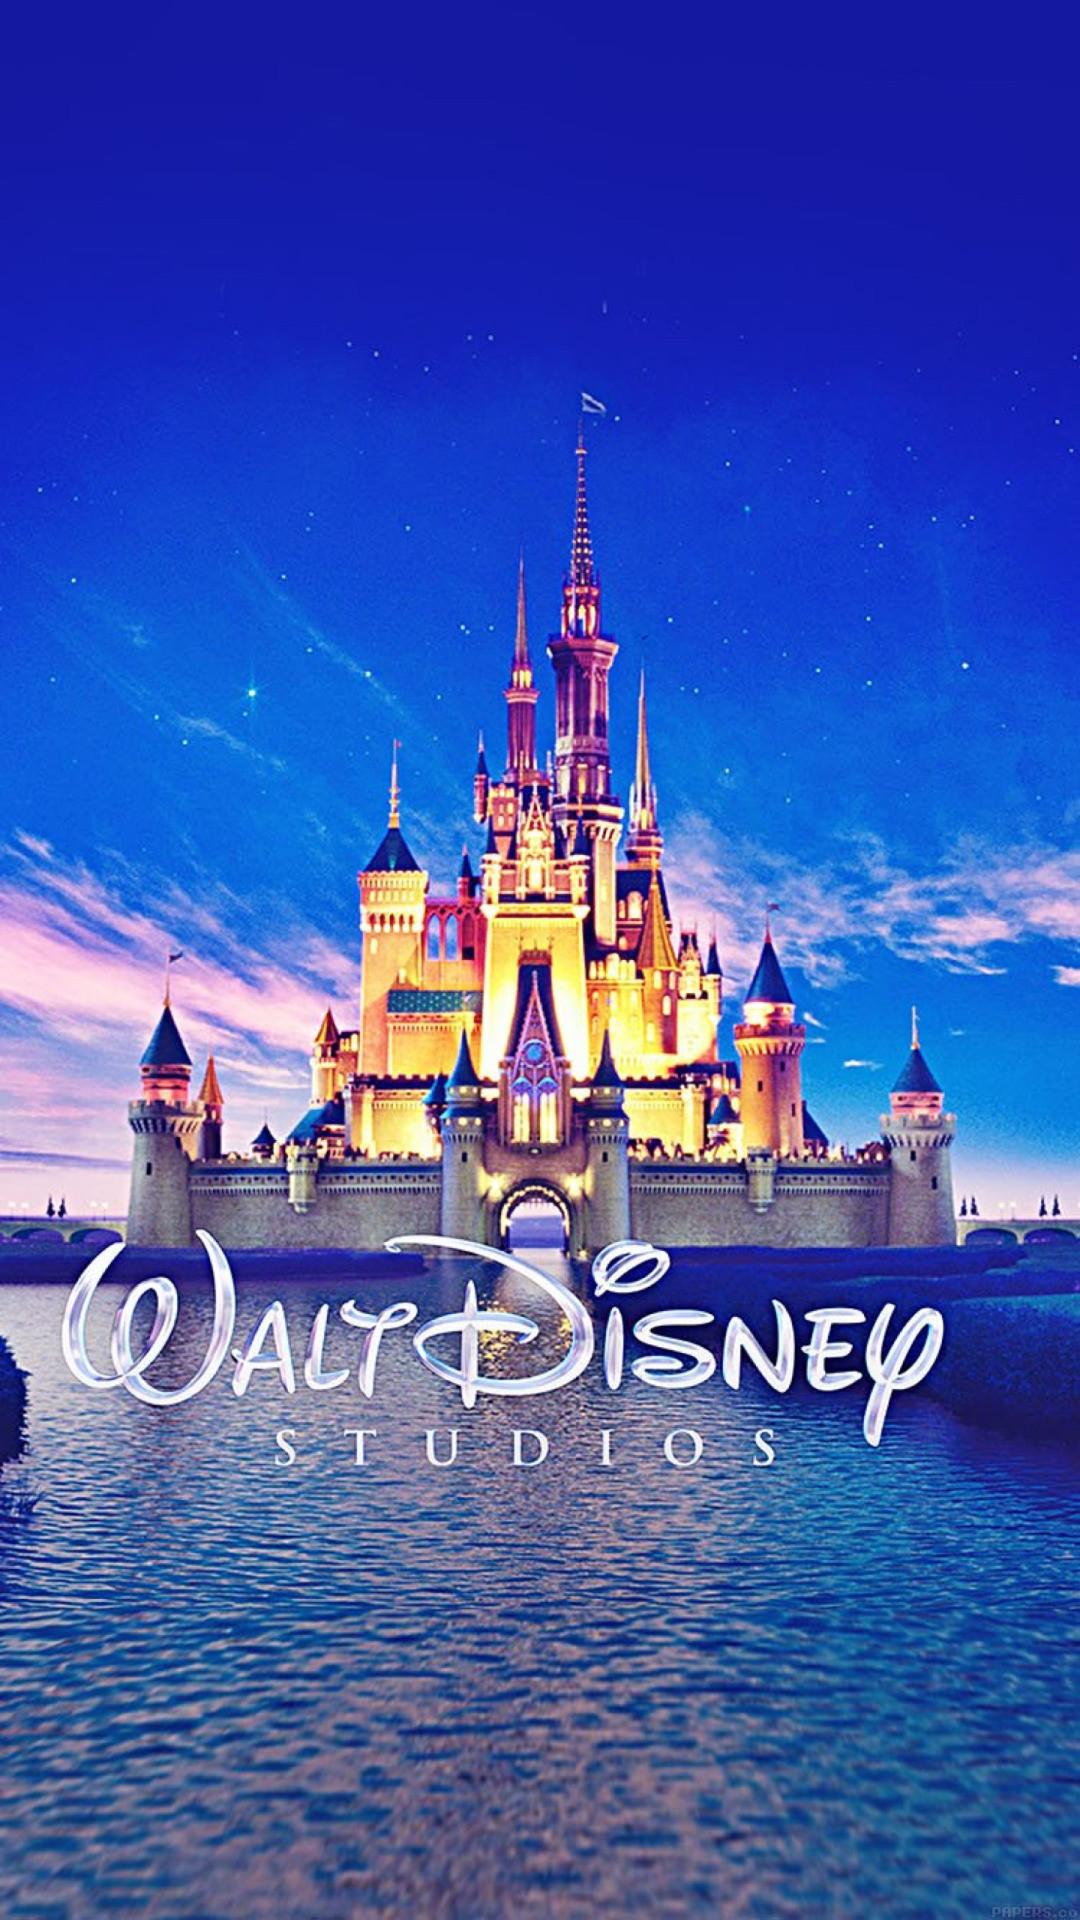 Iphone 5 Disney Wallpaper